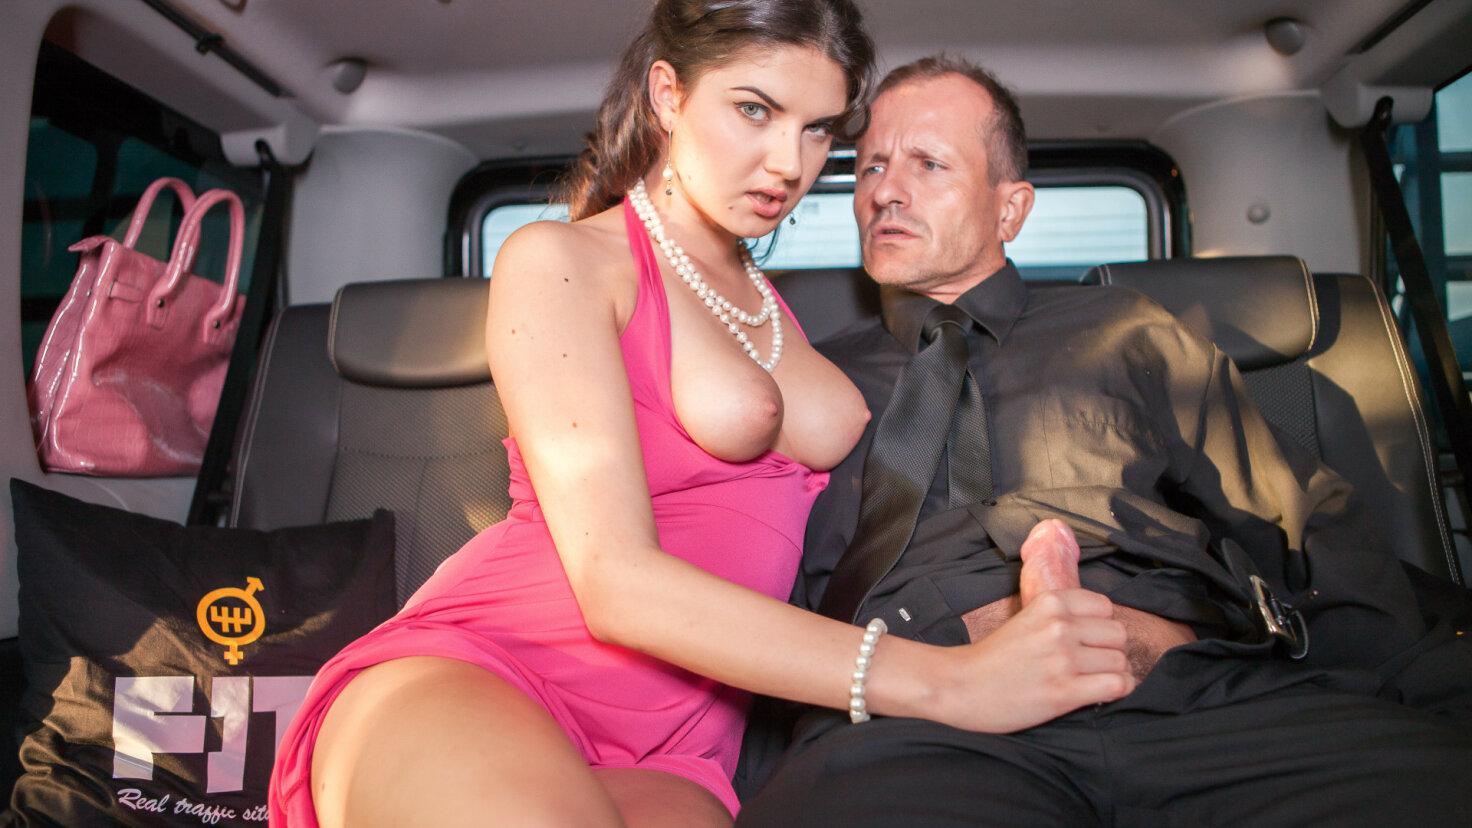 Italian babe Francesca Di Caprio craves some car sex at the airport